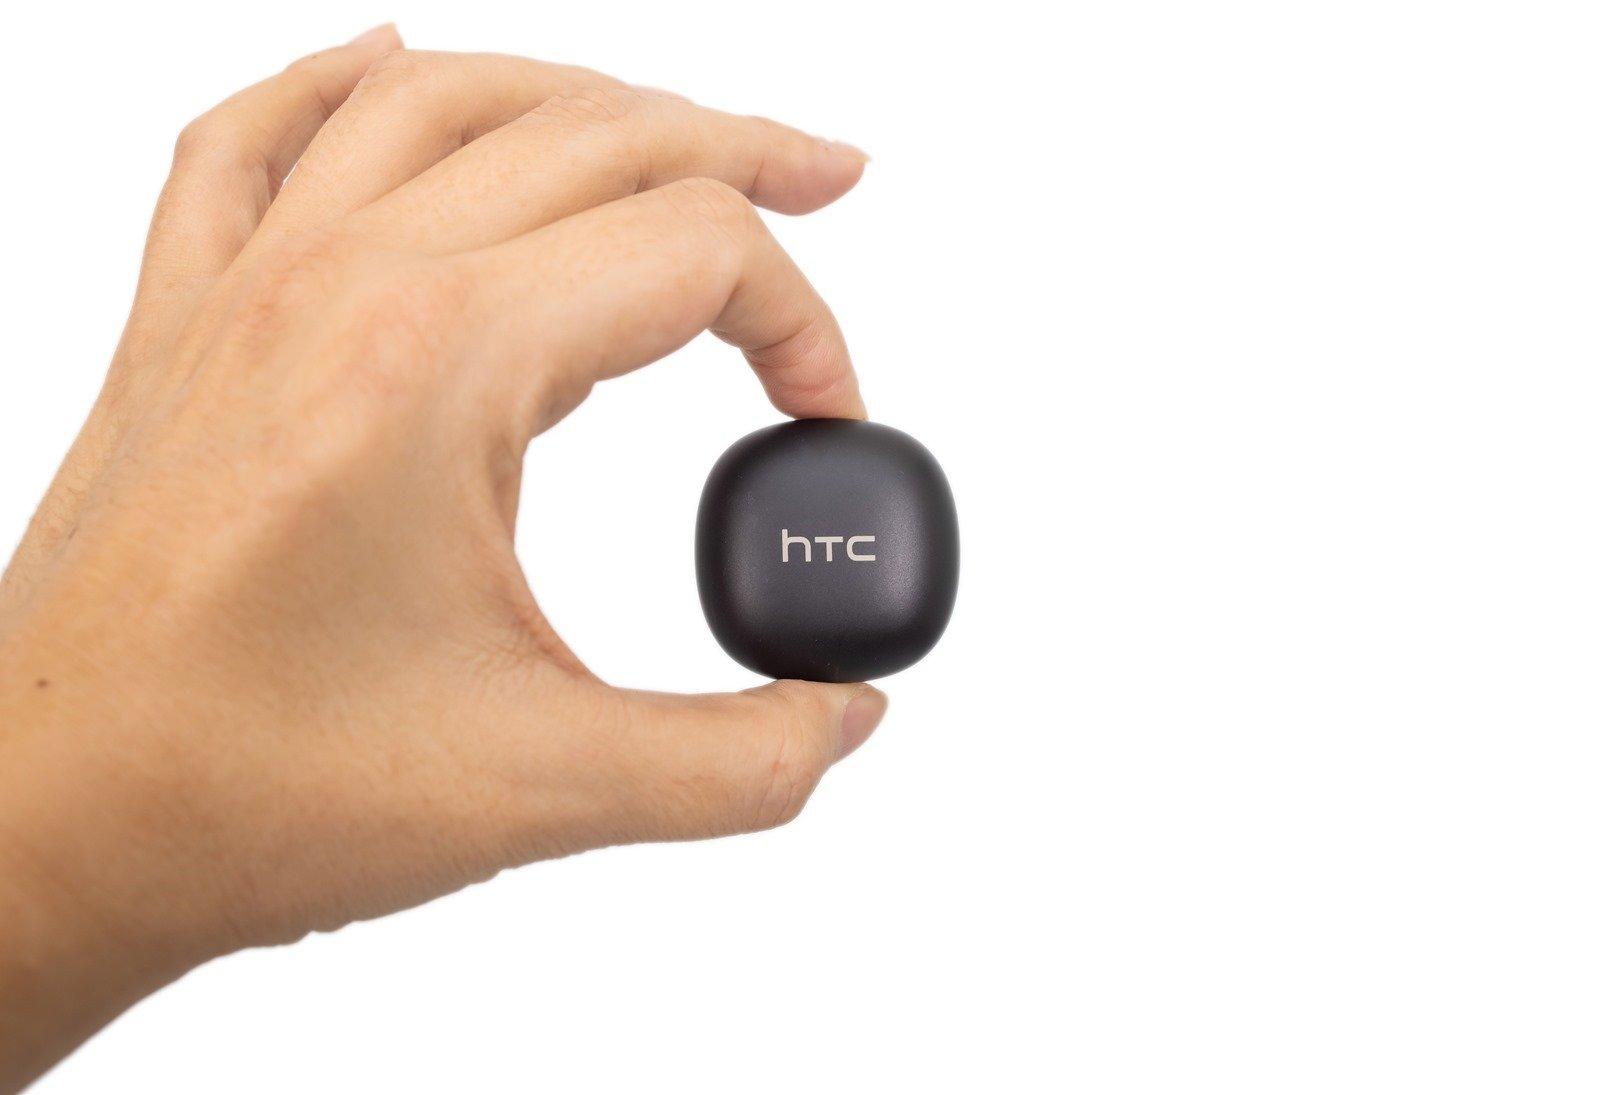 HTC 首款 TWS 真無線藍牙耳機 – HTC 馬卡龍真無線藍牙耳機開箱分享~ @3C 達人廖阿輝